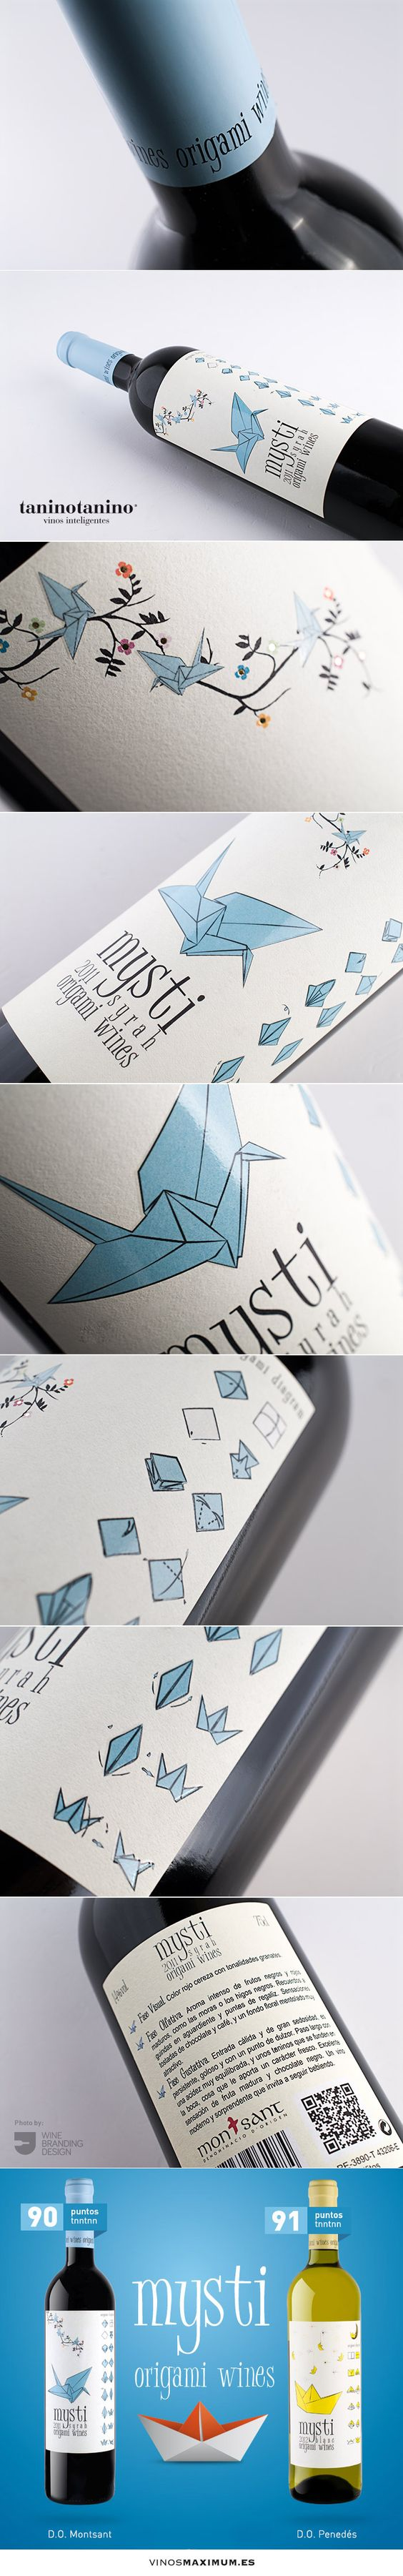 origami wines mysti - TANINOTANINO VINOS INTELIGENTES - VINOS MAXIMUM #wine #packaging #design